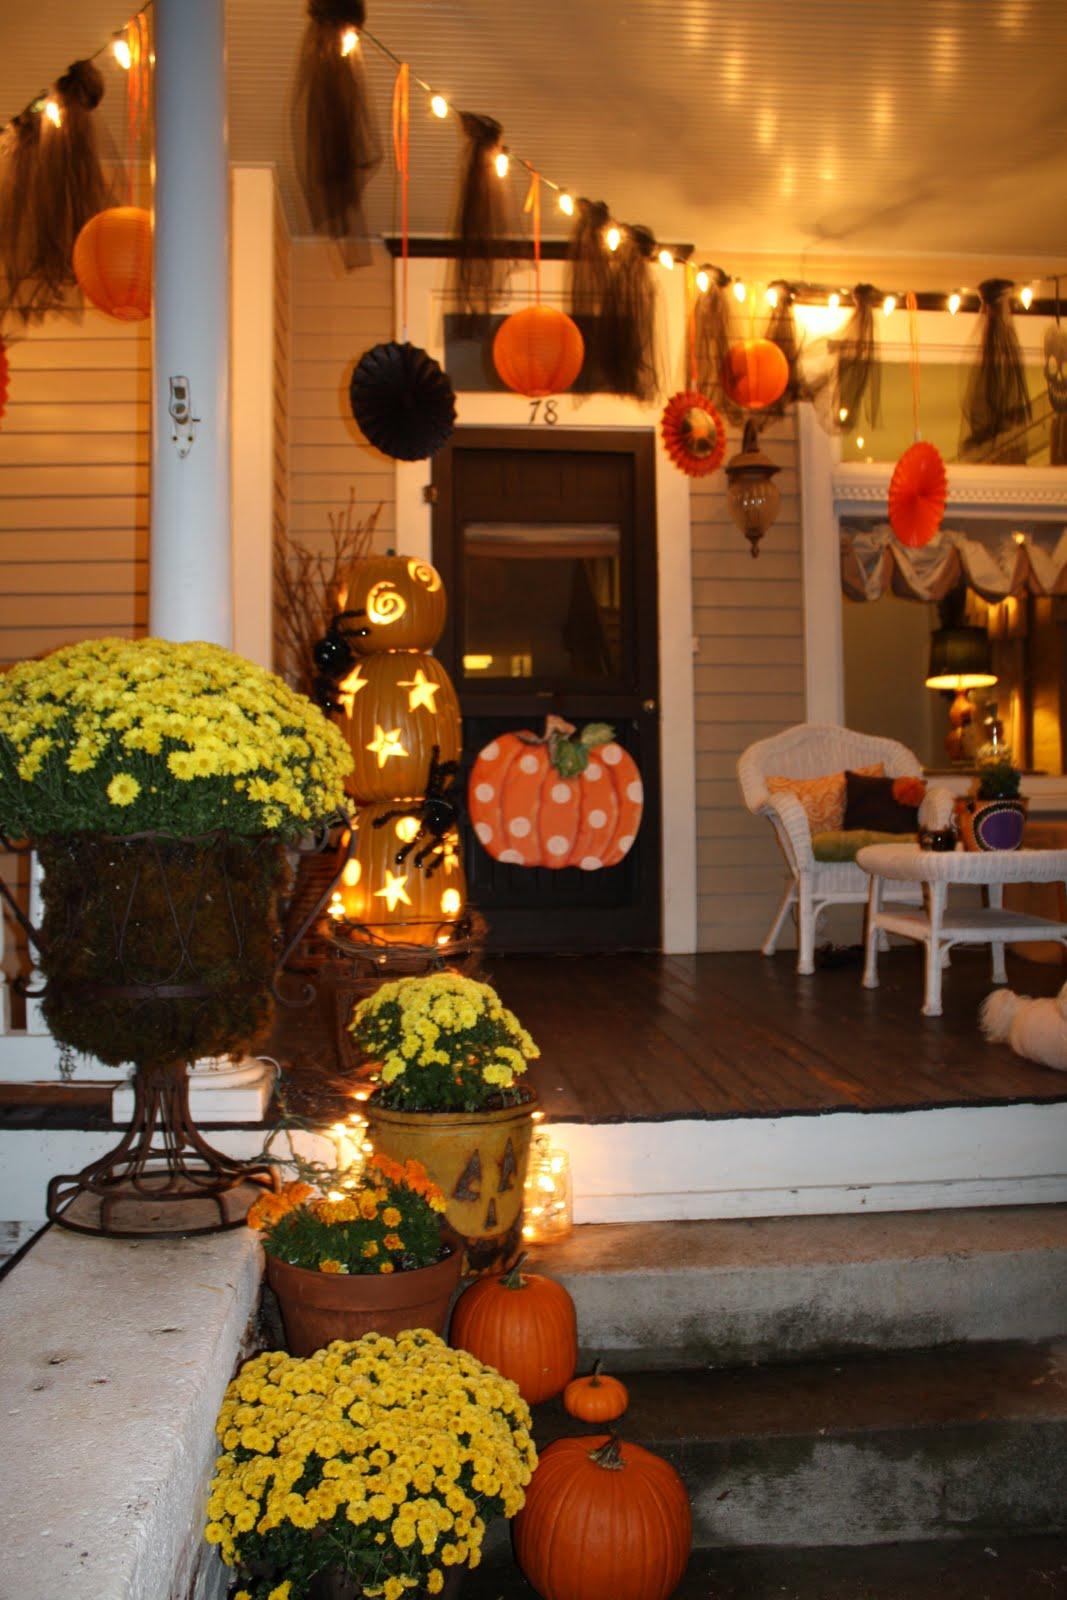 Black Halloween Tree With Orange Lights